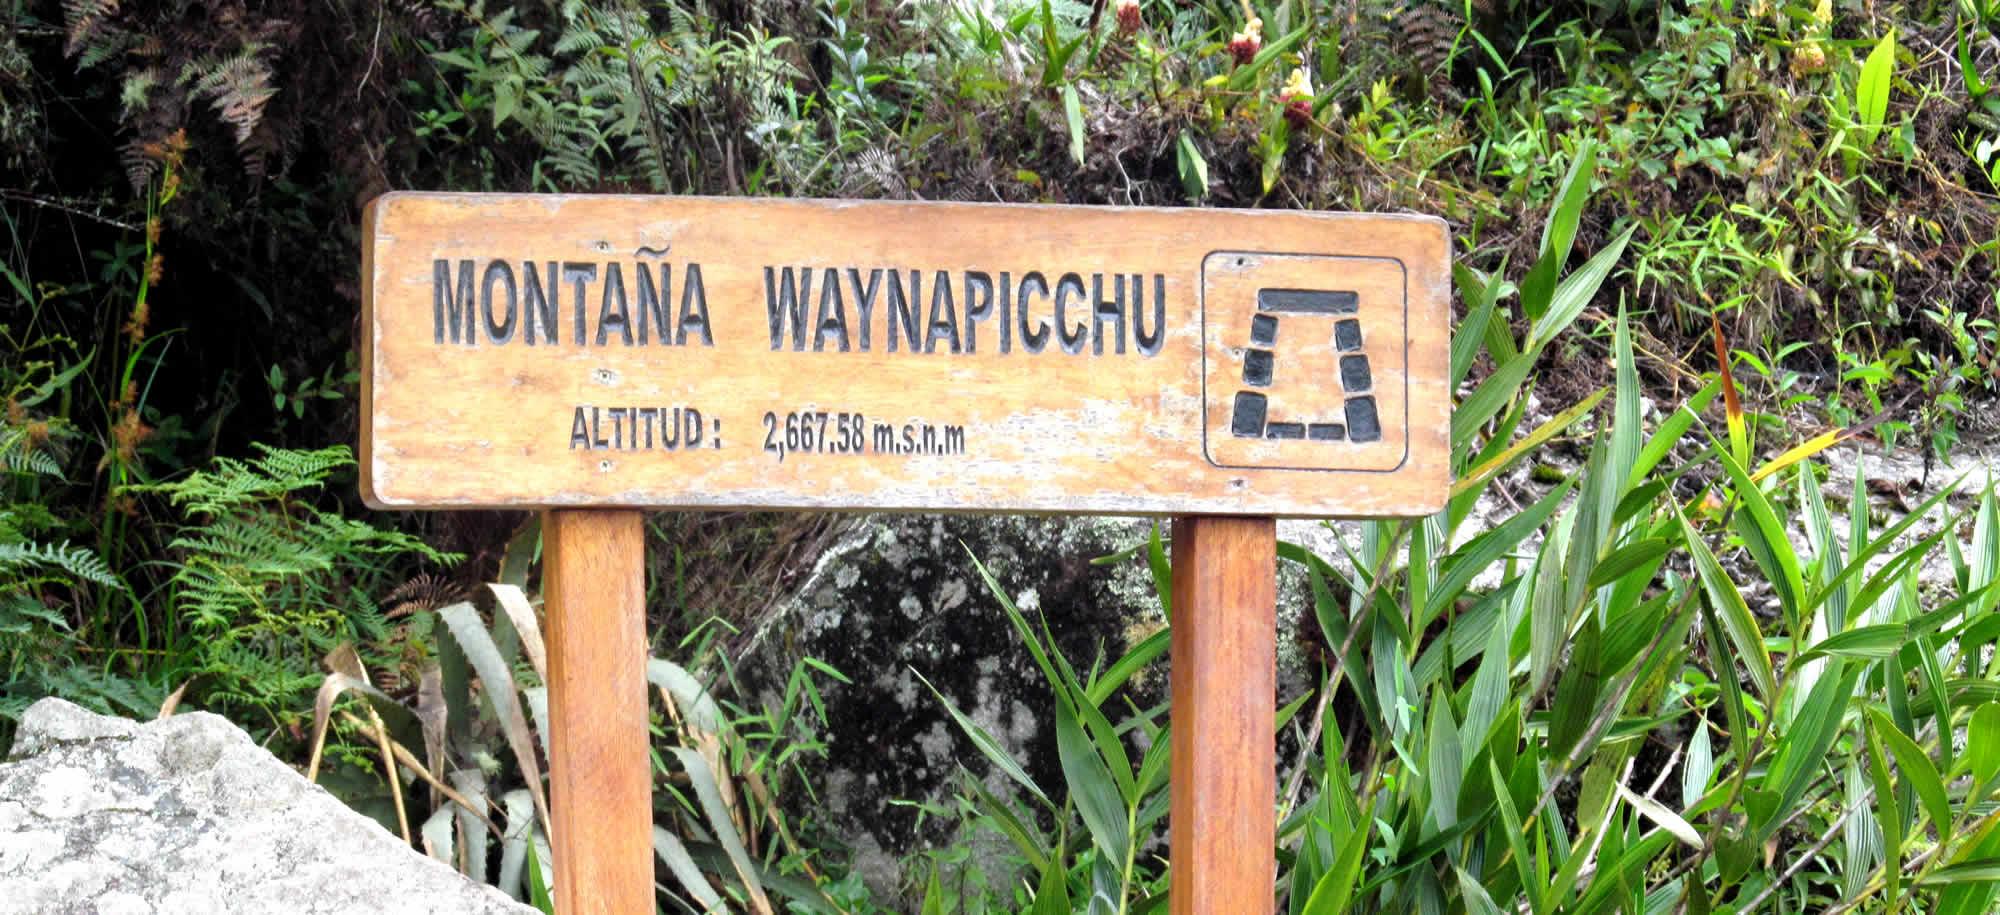 huayna picchu montaña